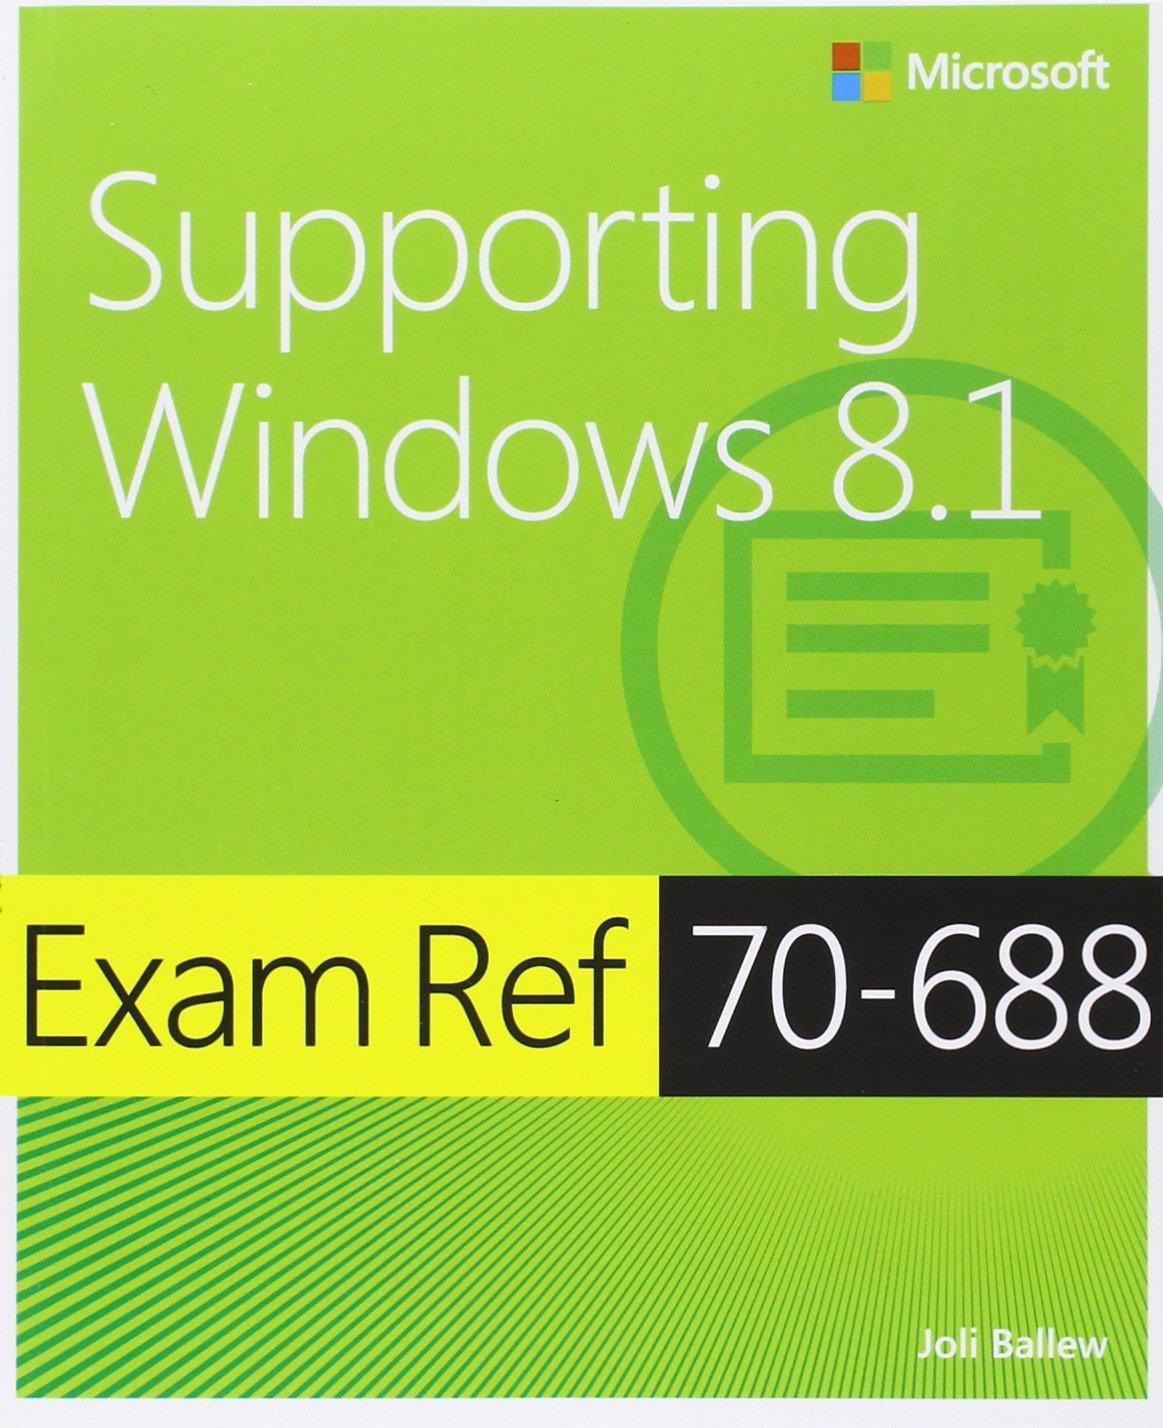 Exam ref 70 688 supporting windows 81 mcsa livros na amazon exam ref 70 688 supporting windows 81 mcsa livros na amazon brasil 9780735684737 fandeluxe Gallery